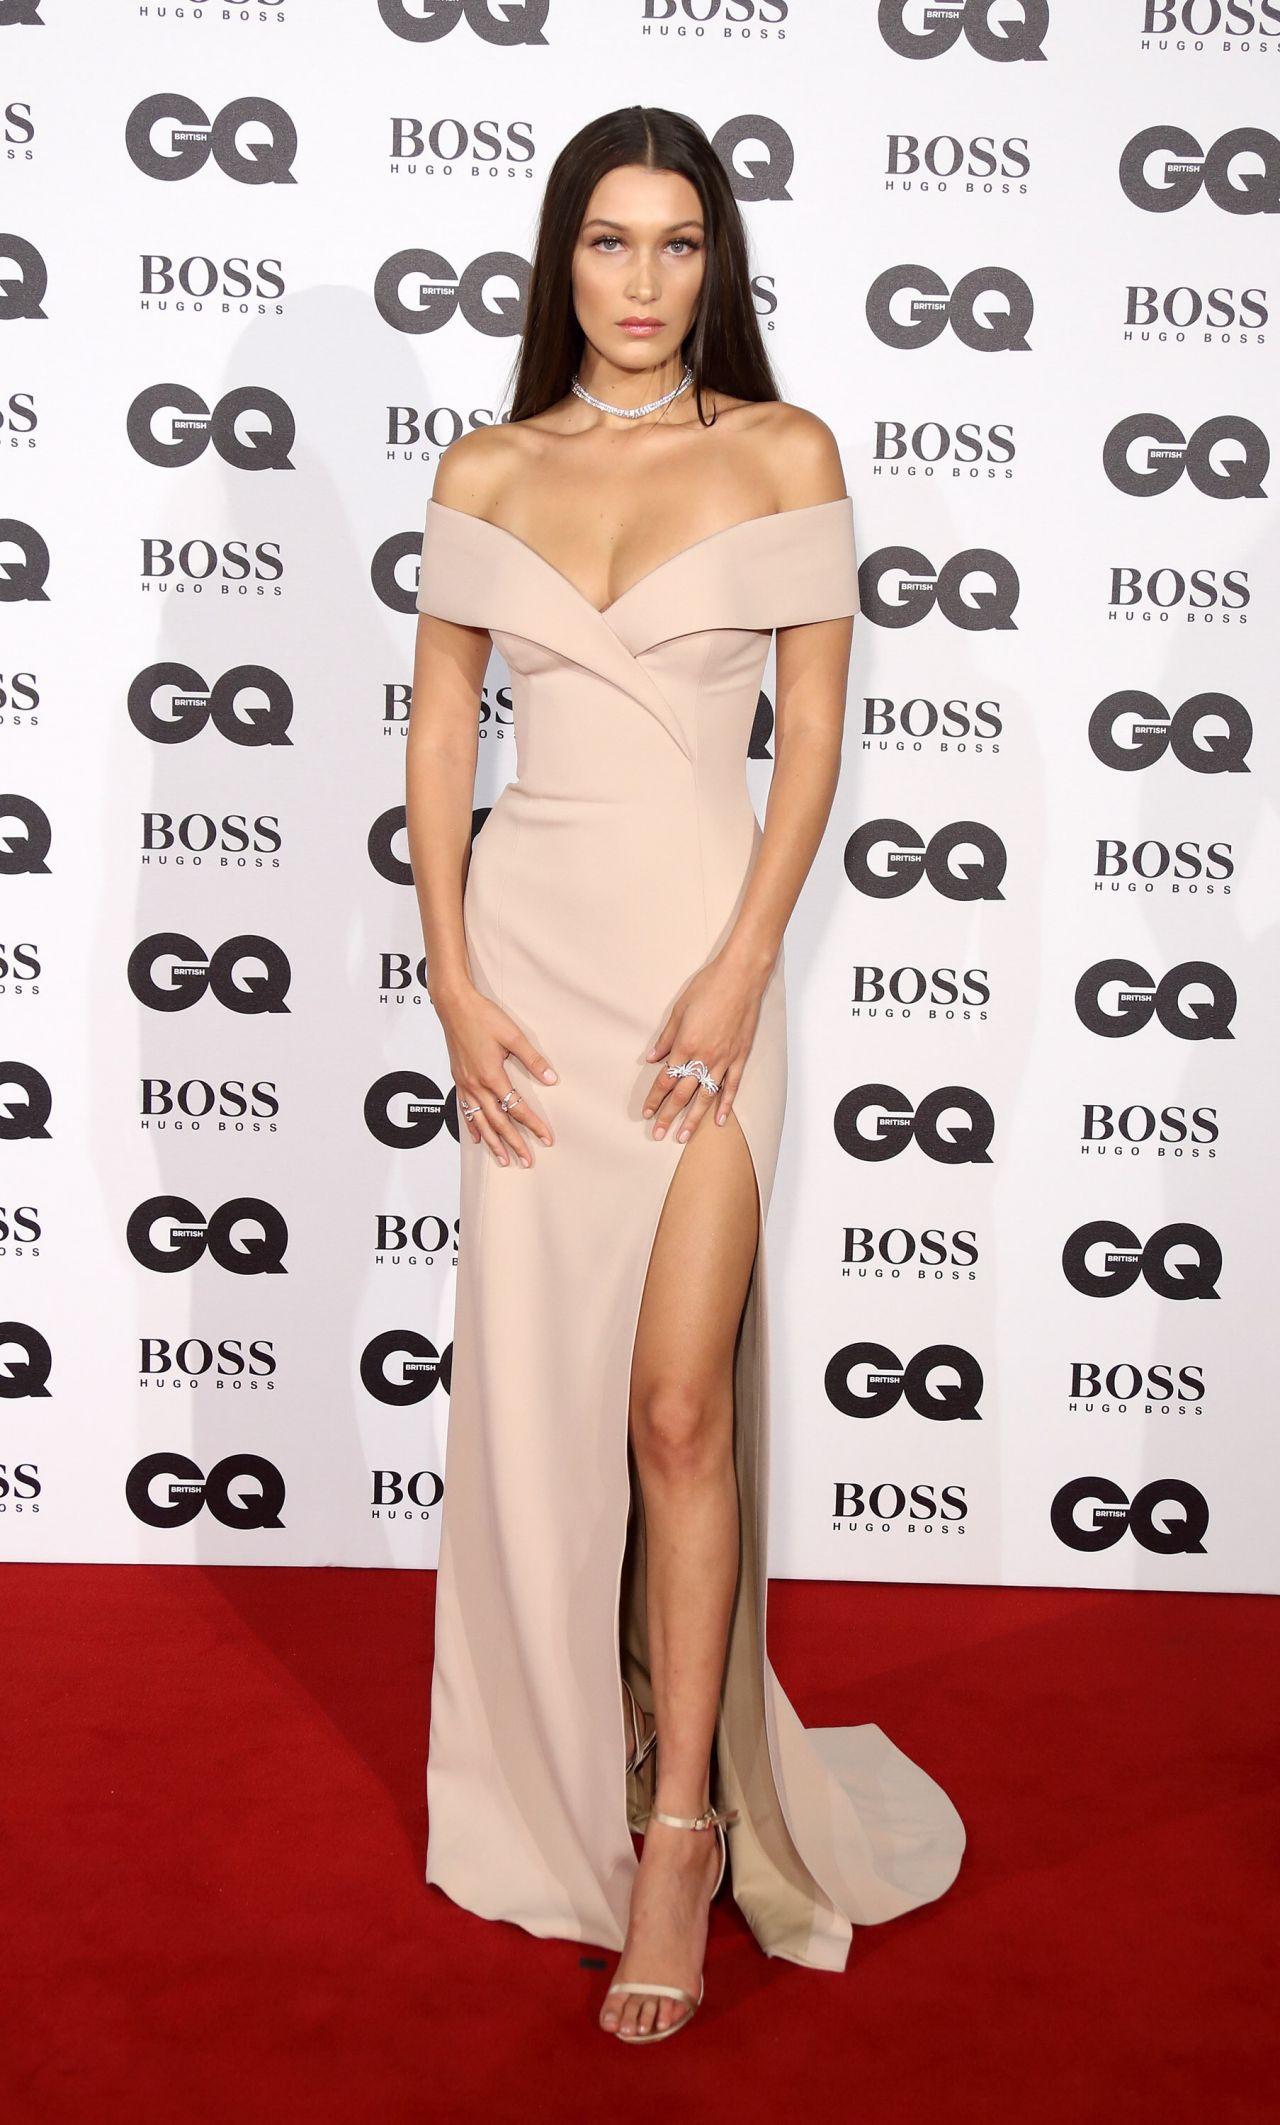 BELLA HADID at GQ Men of the Year Awards 2016 in London 09